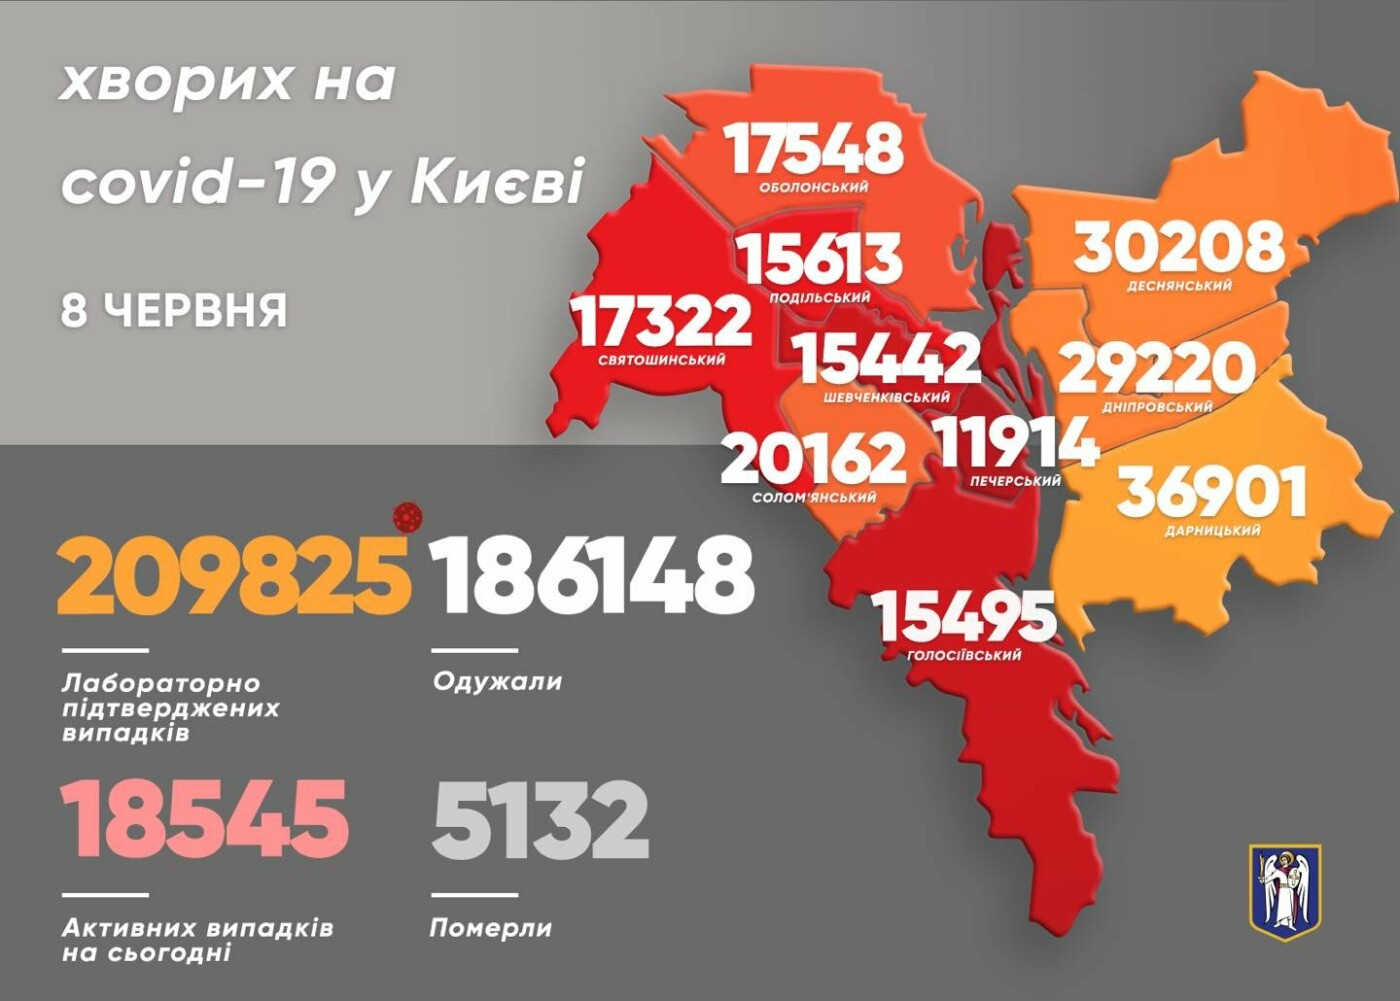 Коронавирус в Киеве: появилась статистика COVID-19 по районам за 8 июня, Картинка: Виталий Кличко